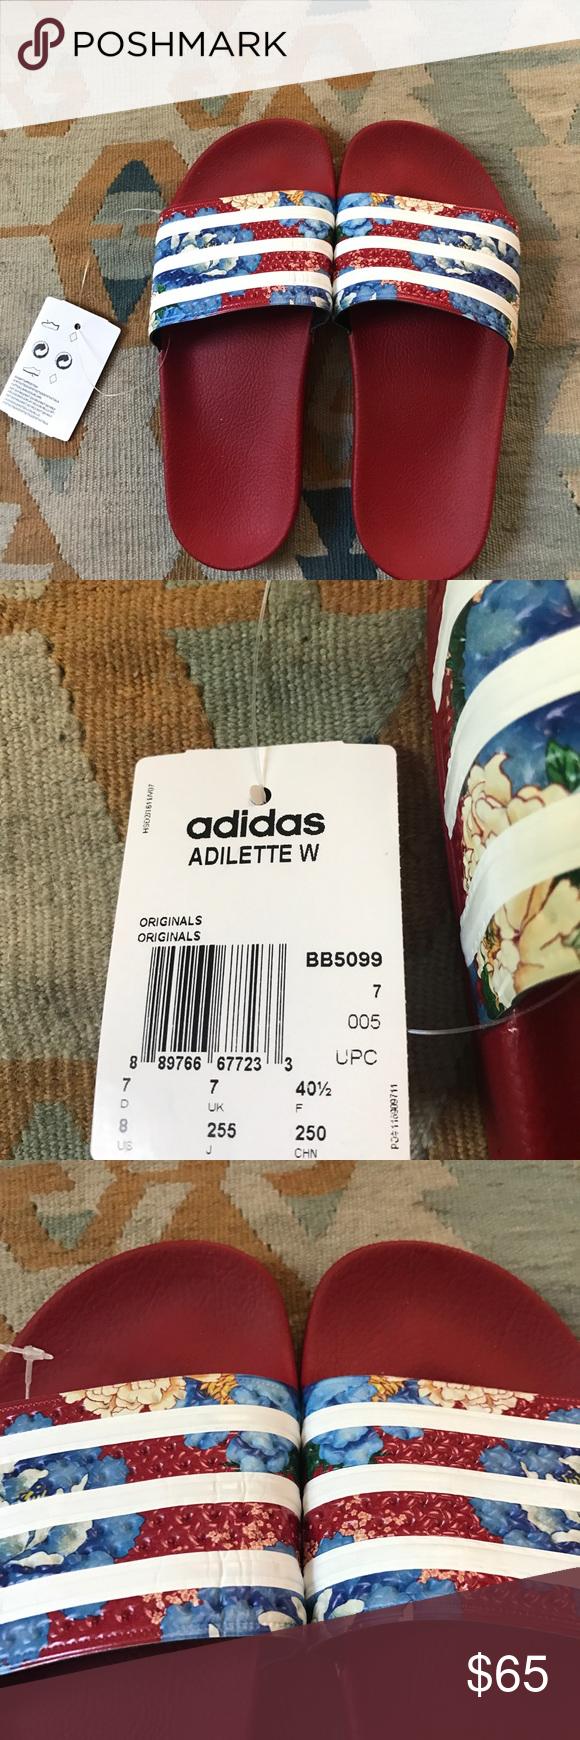 dbd06efbaebe9 NWT adidas adilette slides